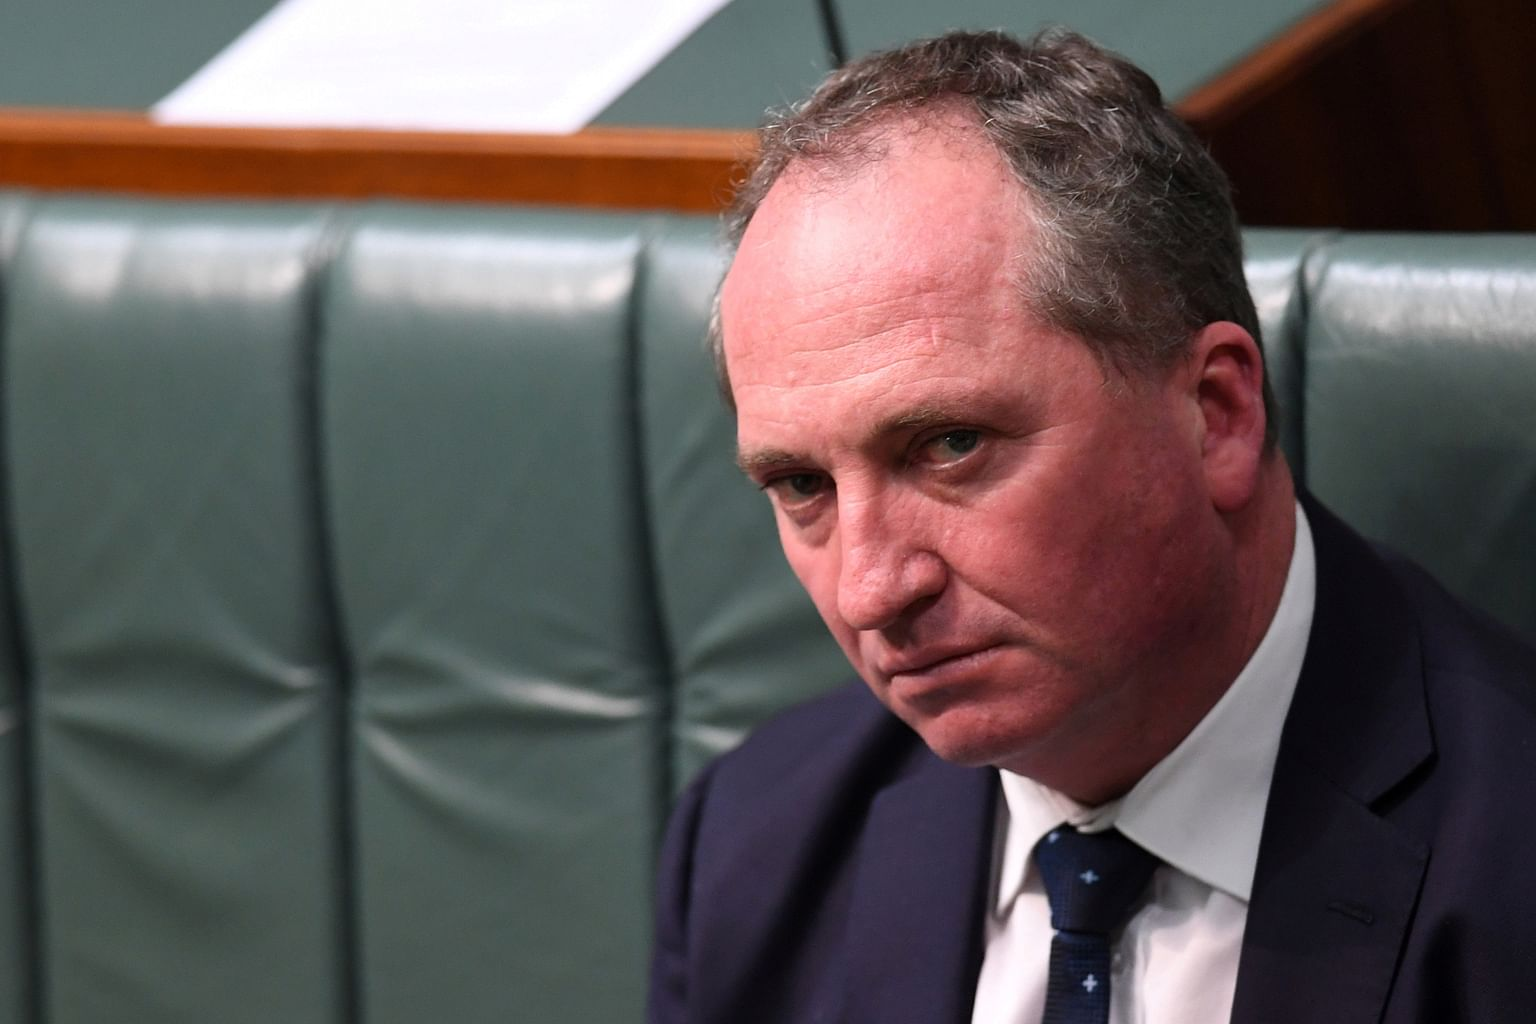 Hubungan sulit Timbalan PM Australia jadi isu